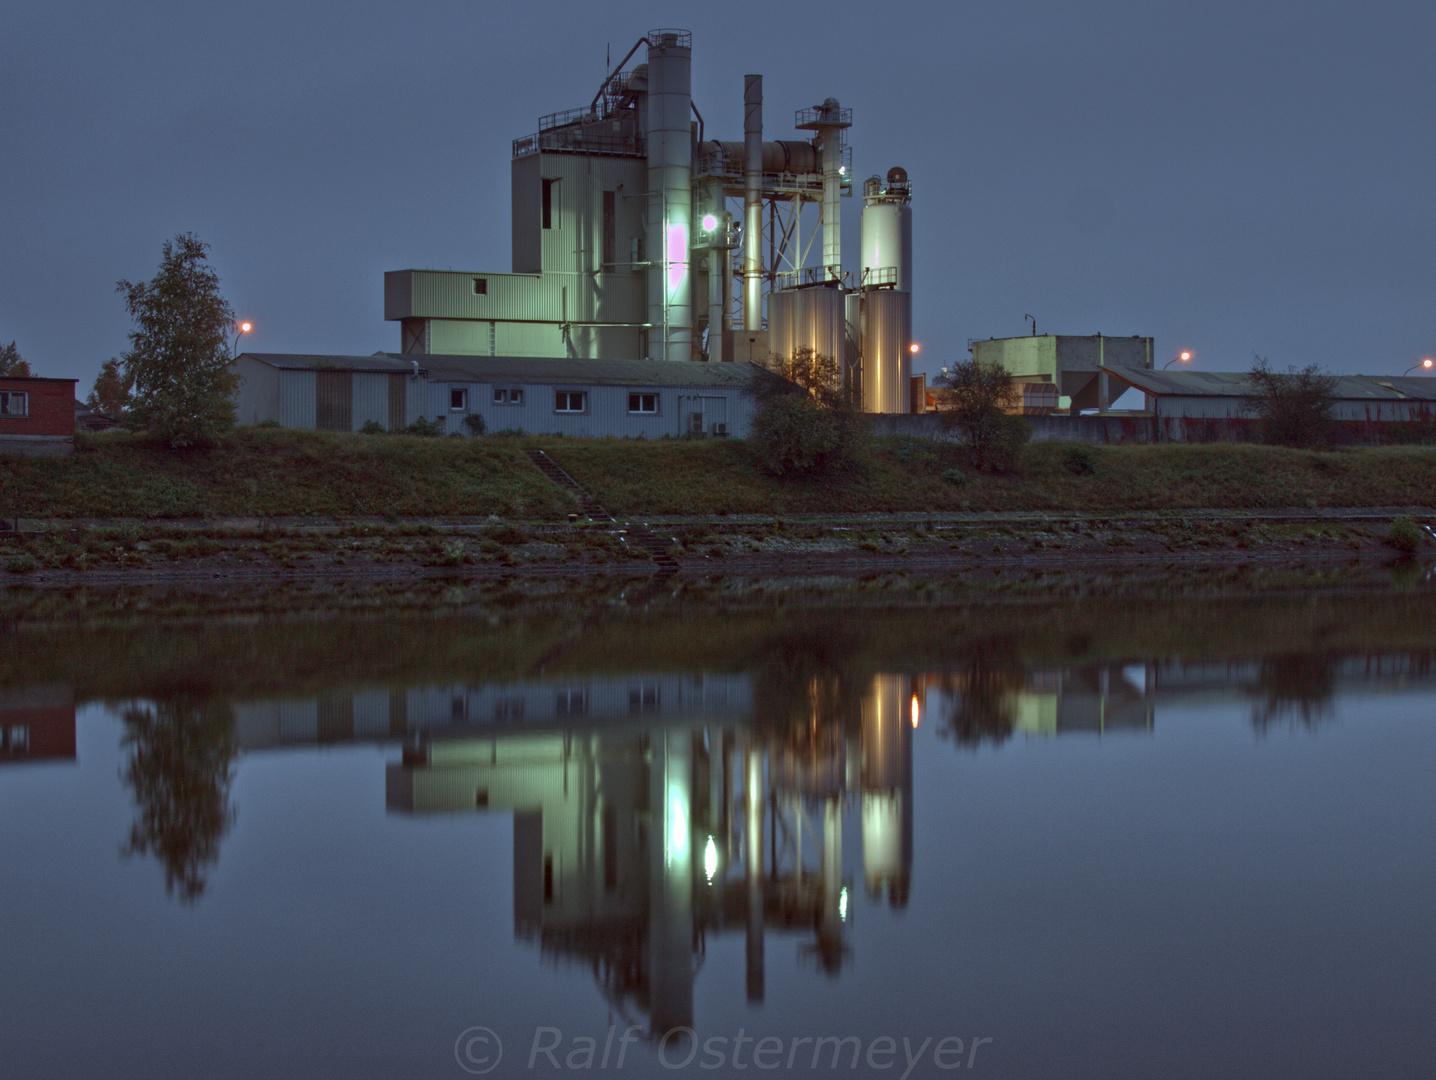 Fabrikation am Neckar